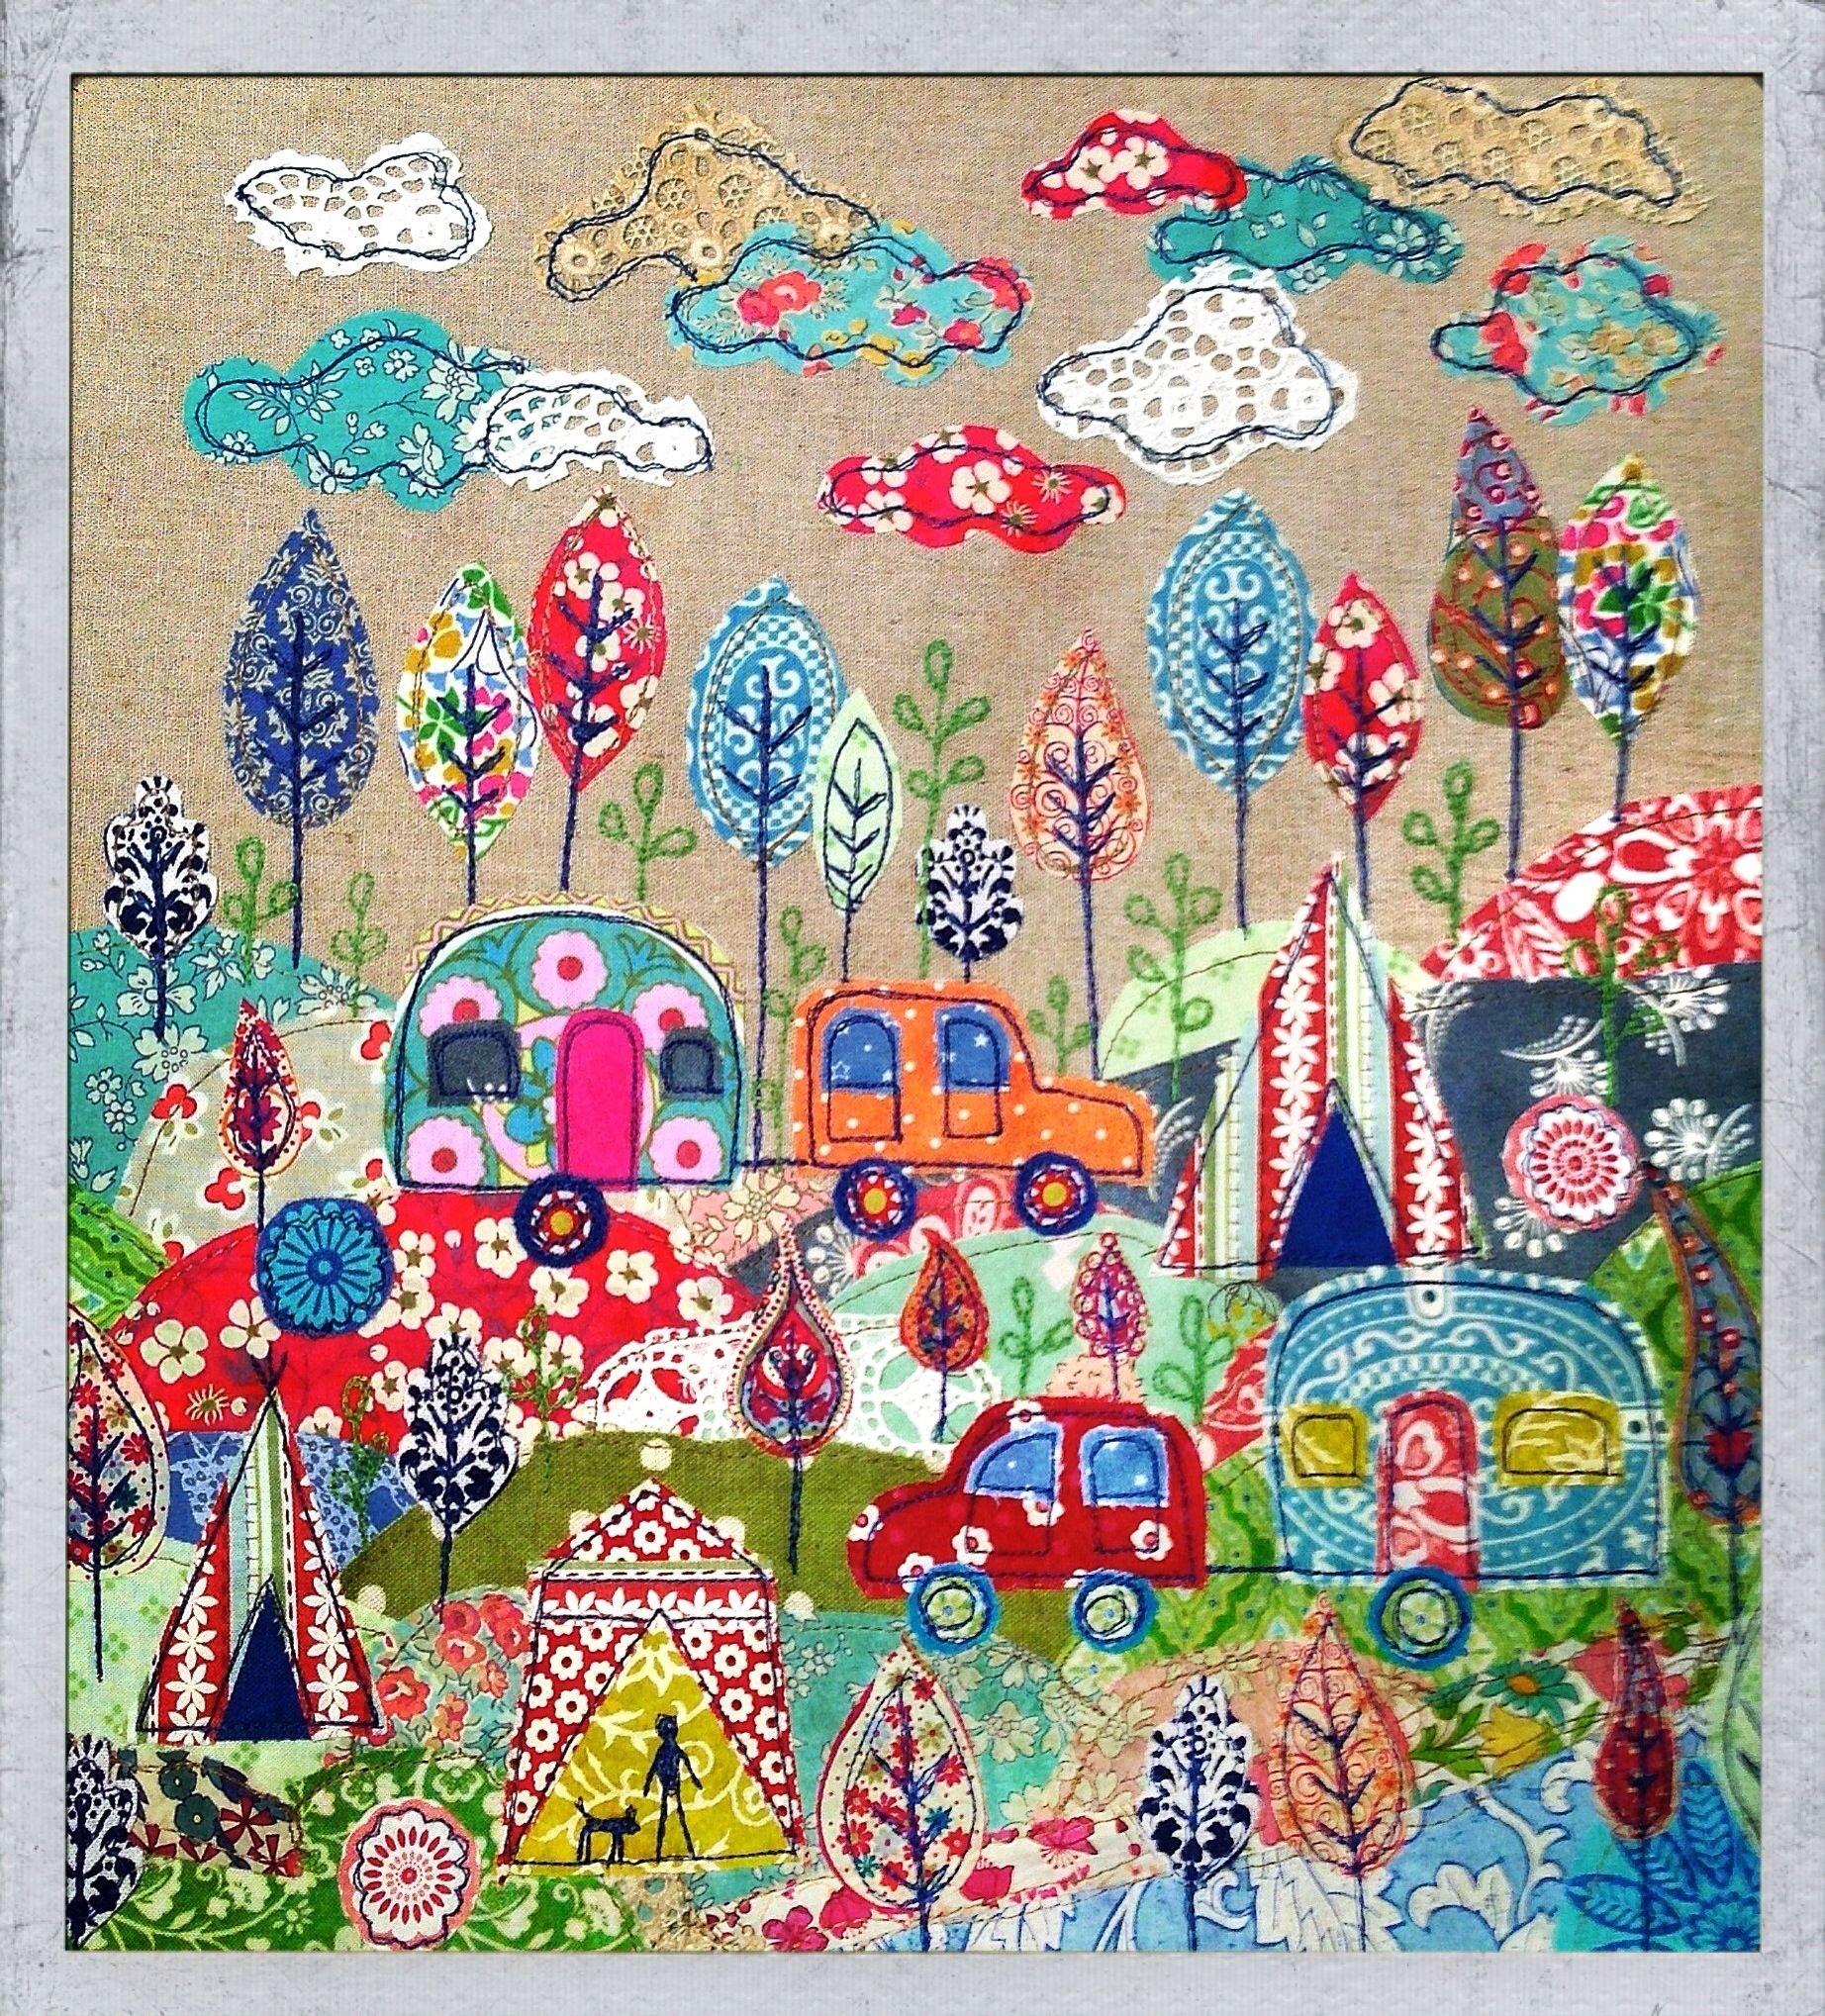 Camping Print Art Quilts Camping Quilt Applique Quilts